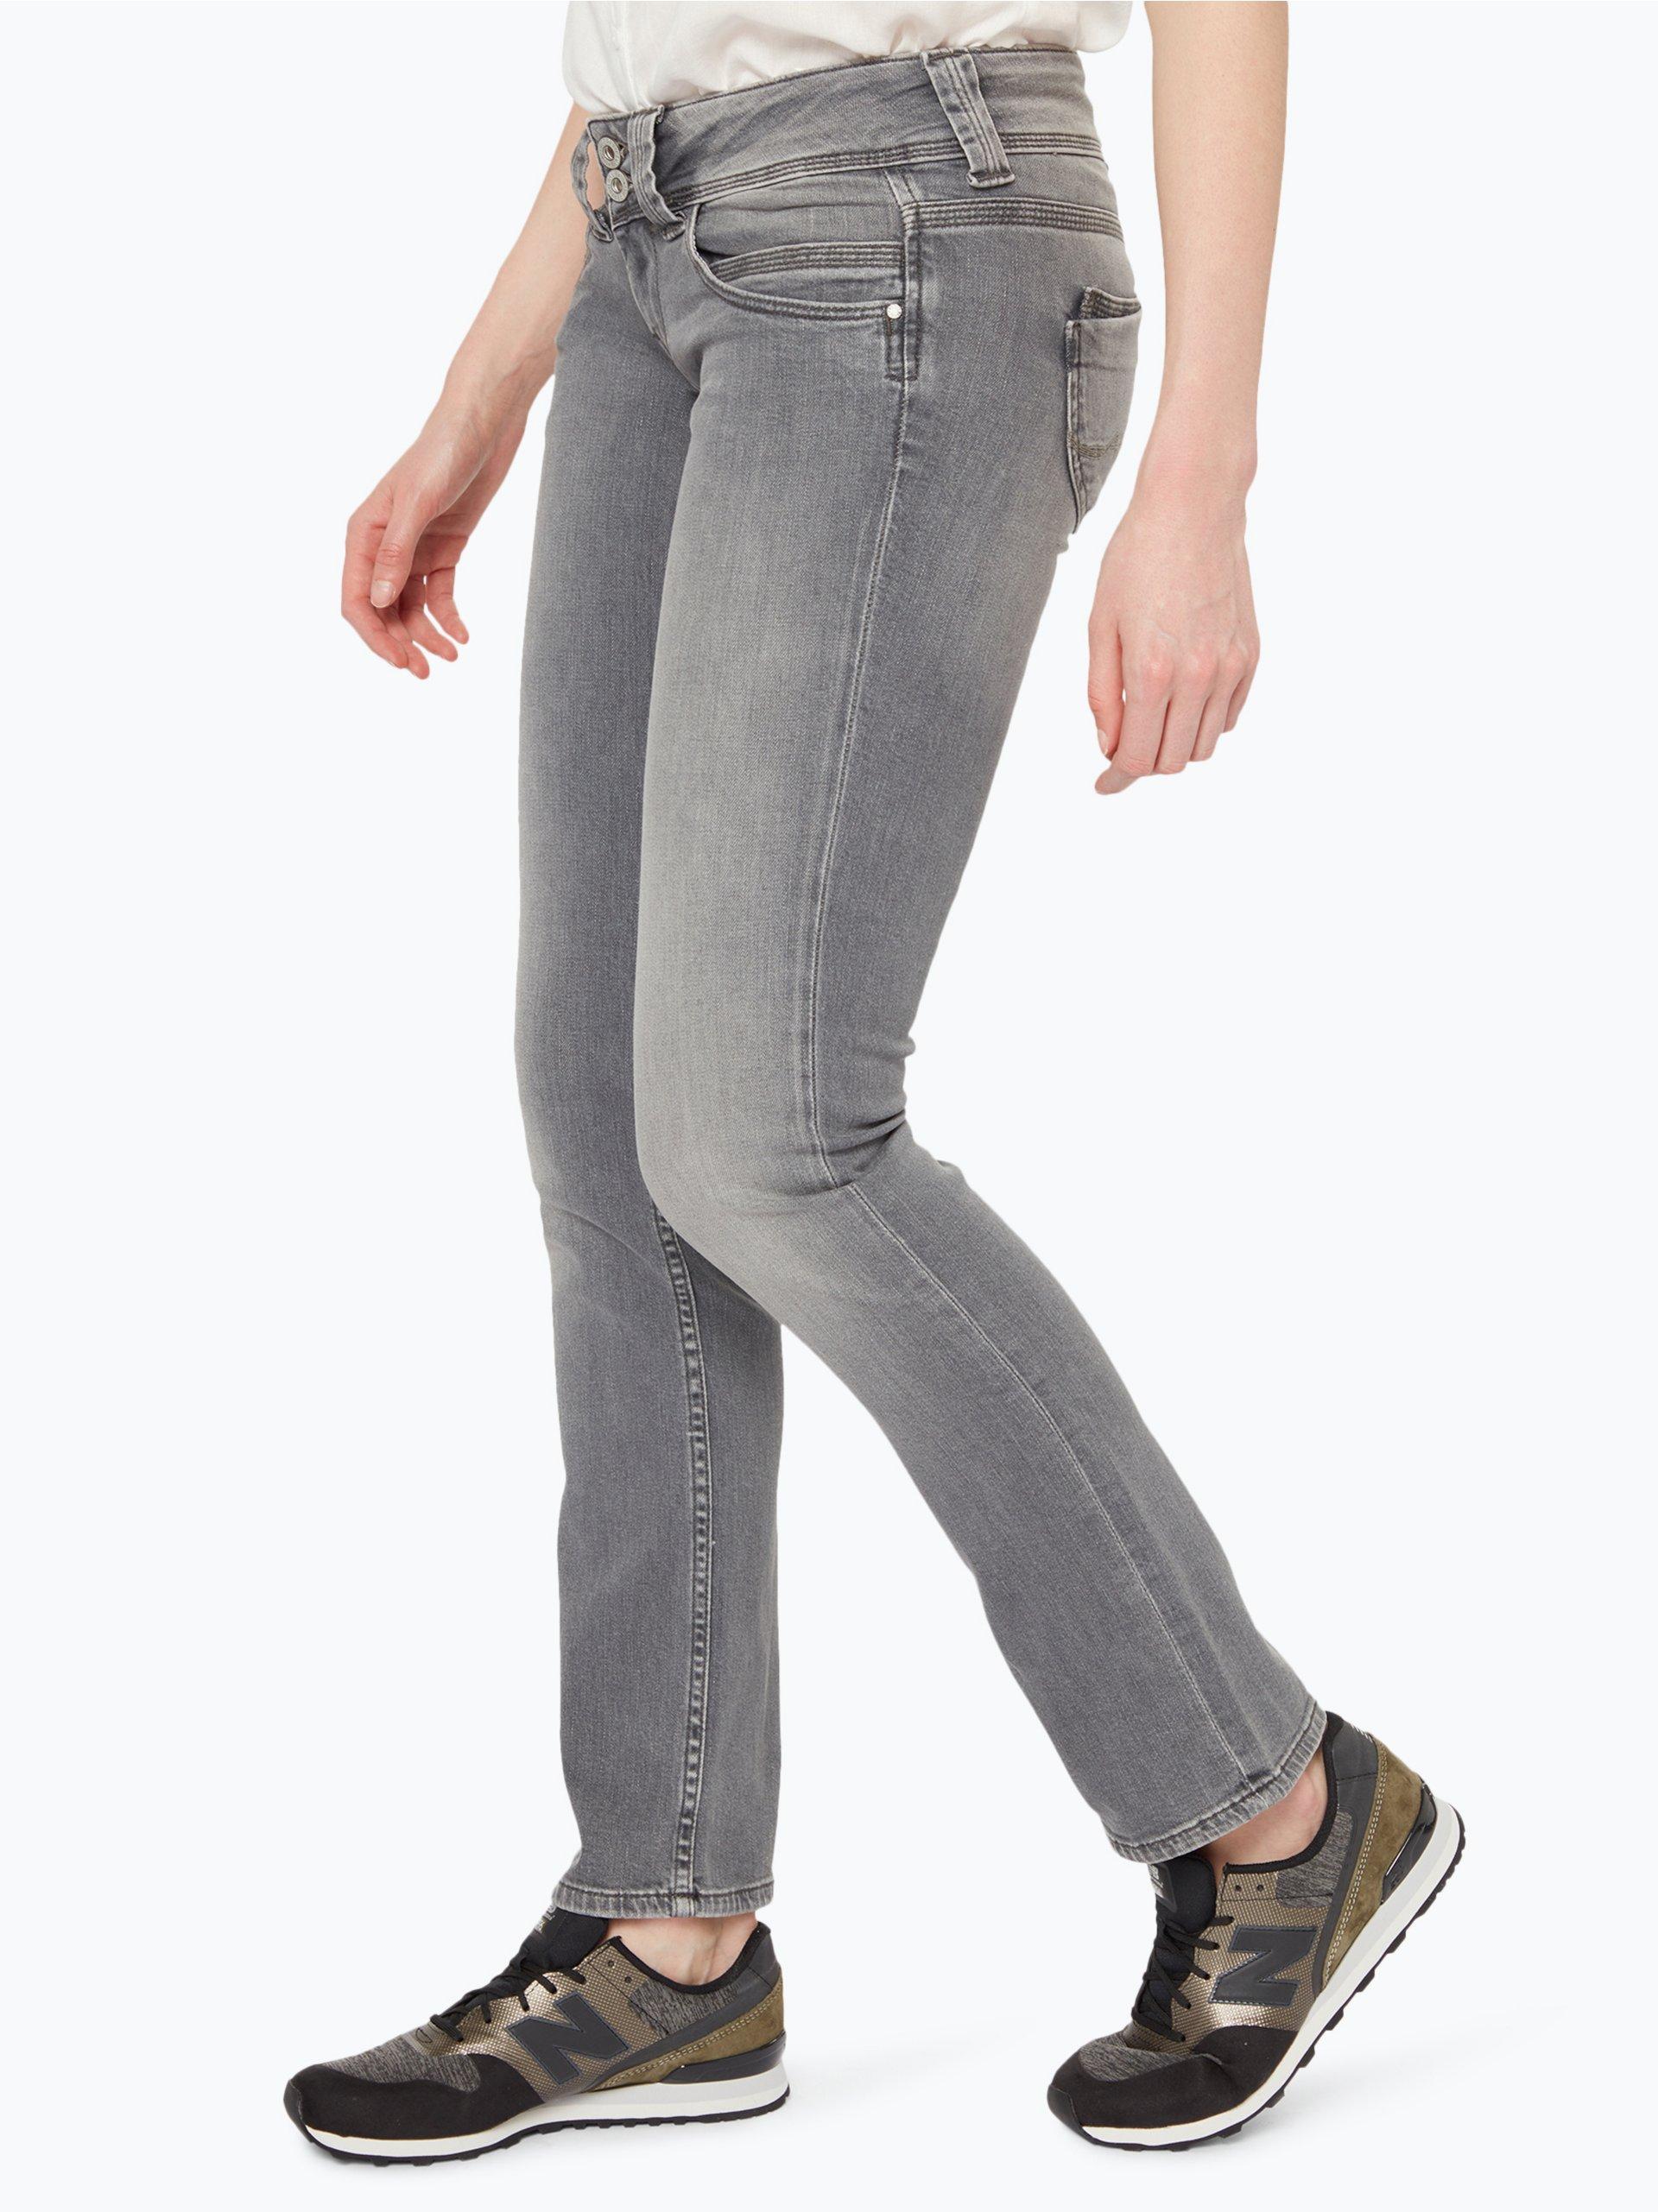 pepe jeans damen jeans venus 2 online kaufen peek und cloppenburg de. Black Bedroom Furniture Sets. Home Design Ideas